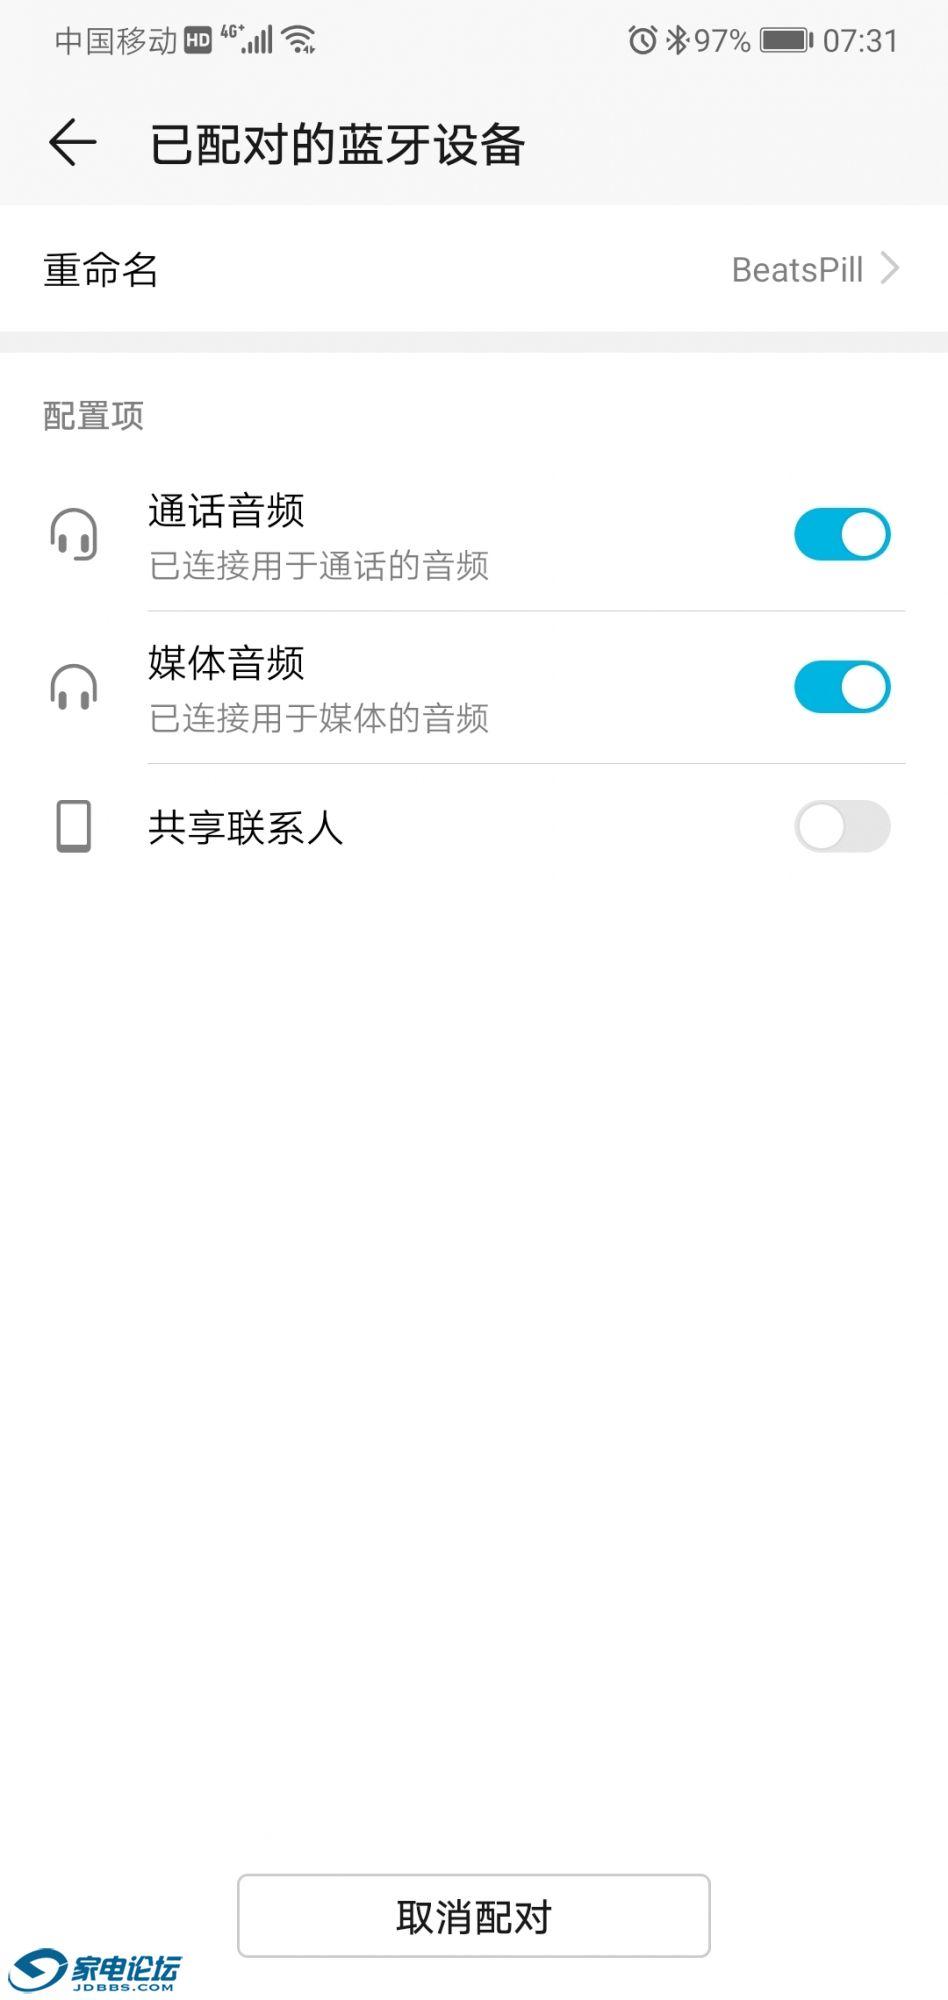 Screenshot_20190702_073146_com.android.settings.jpg